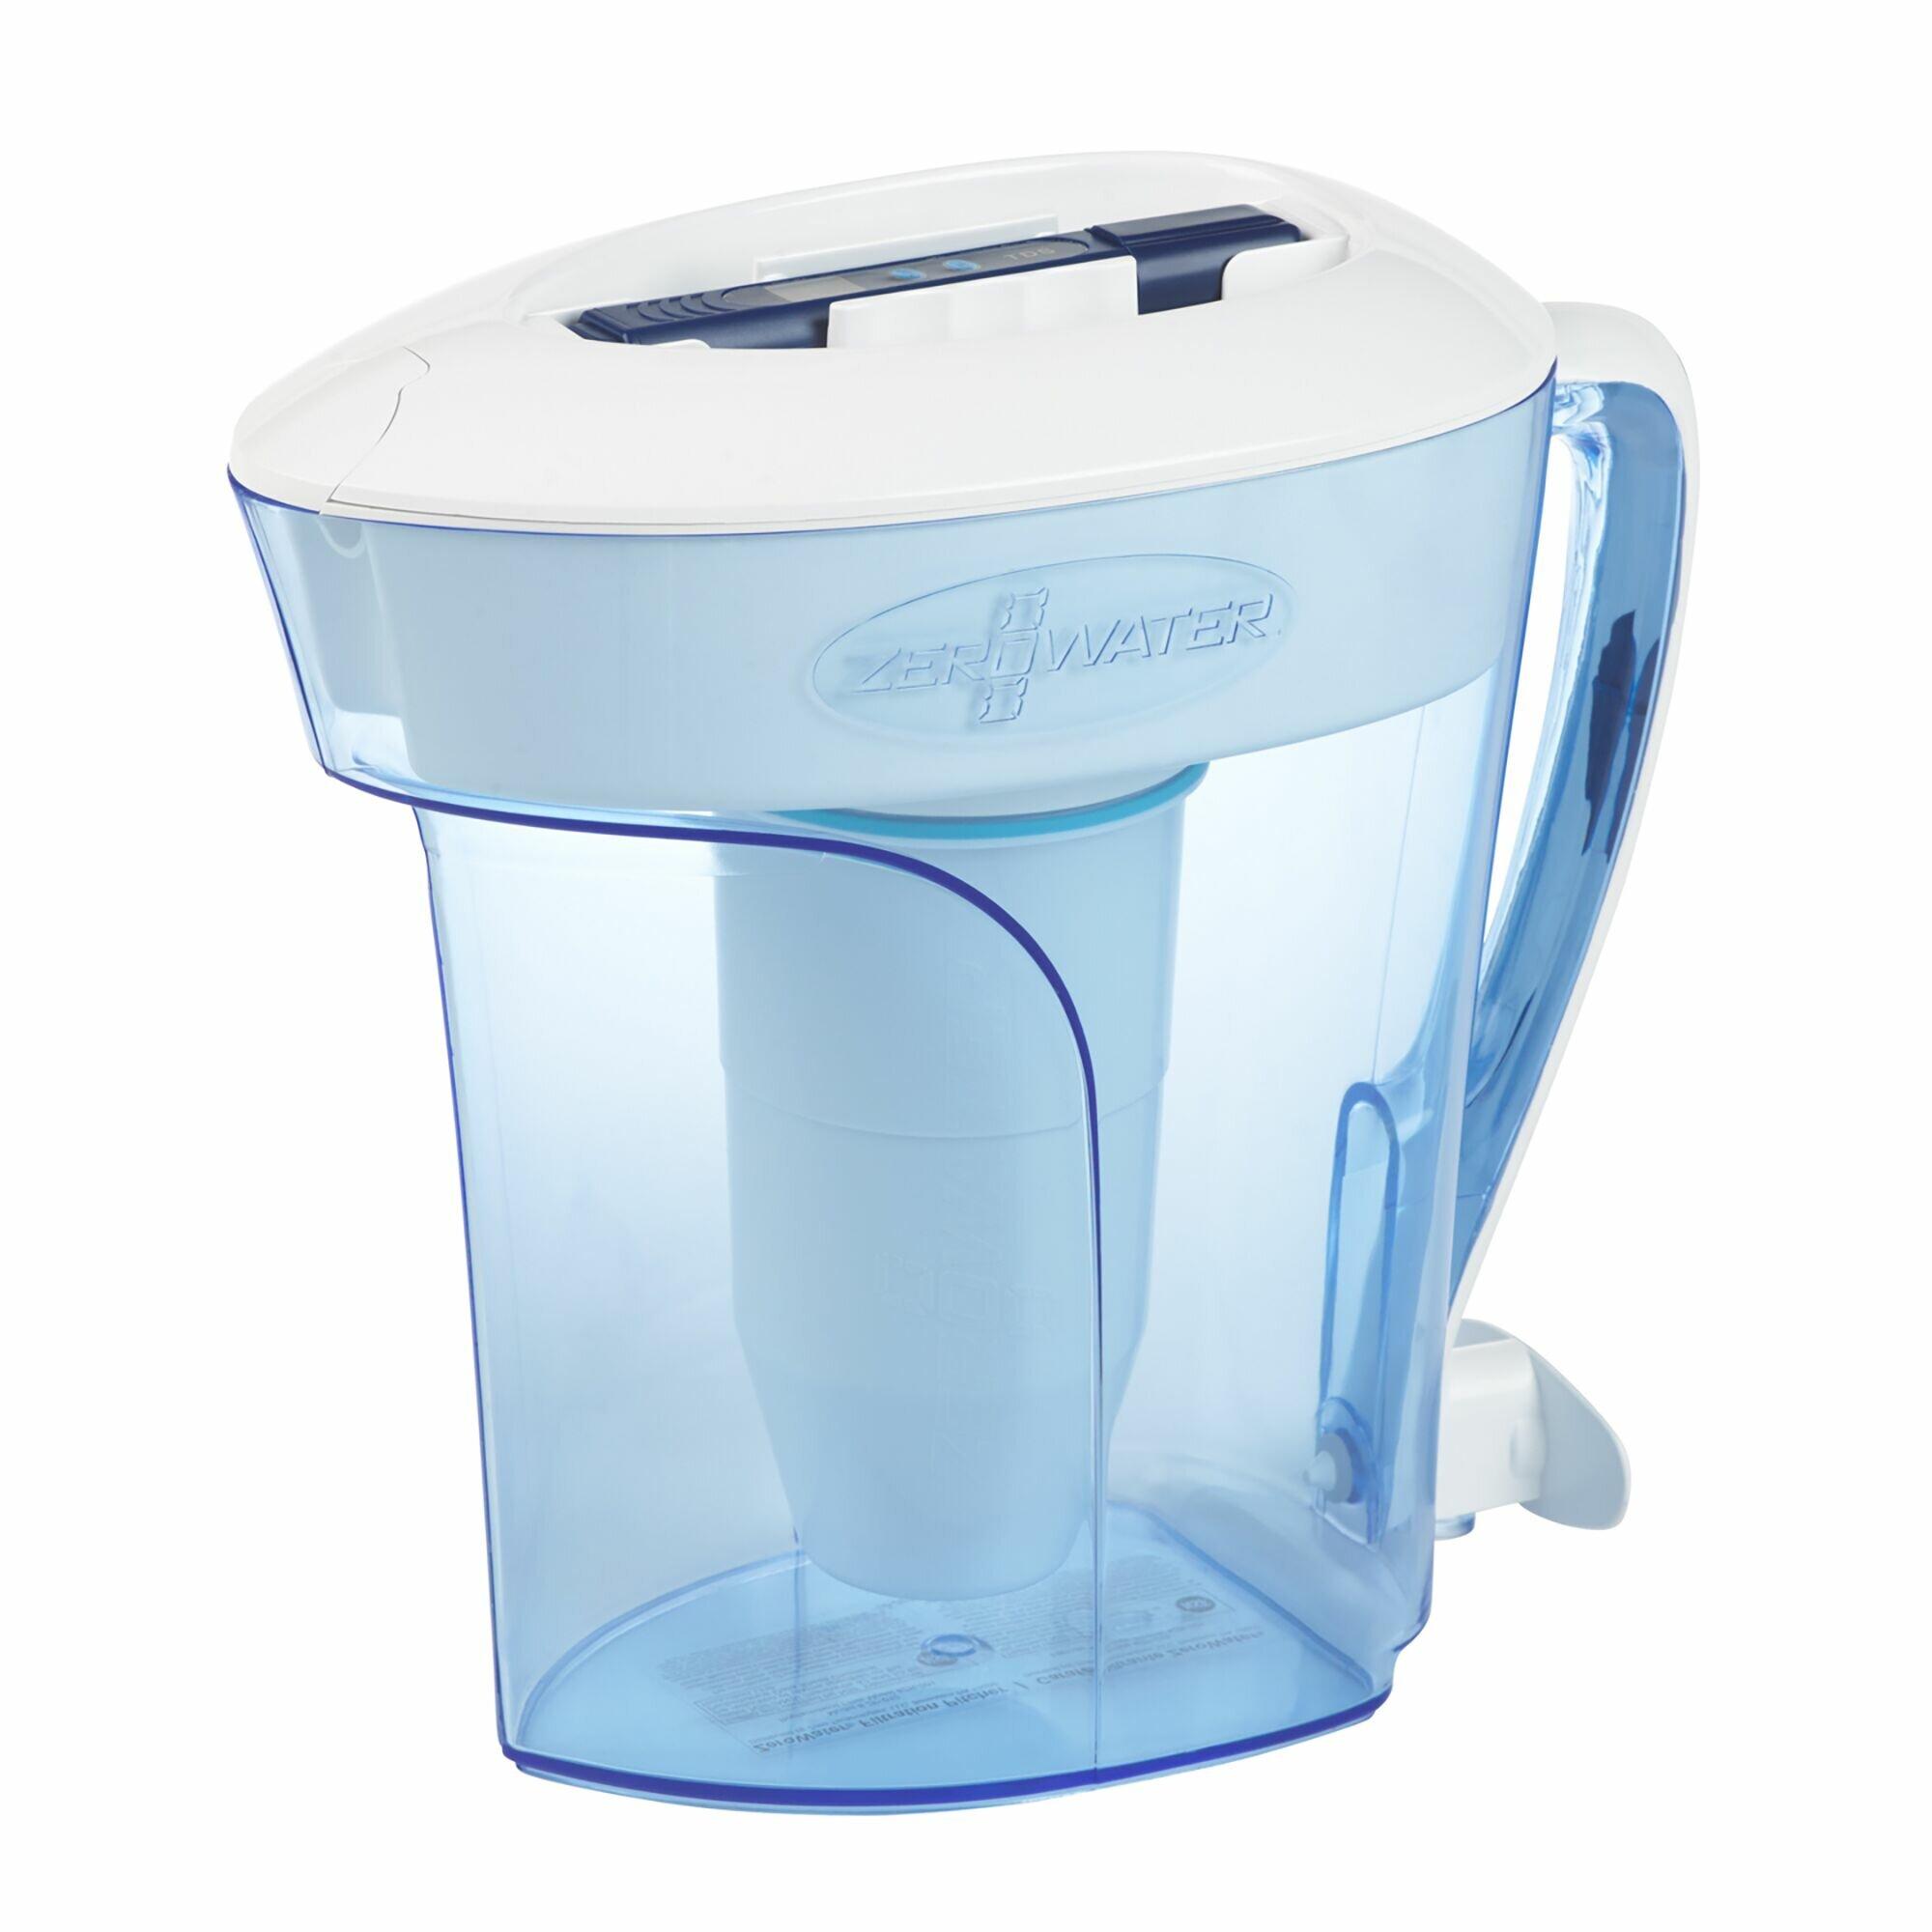 ZeroWater 10-Cup Water filtration pitcher   Wayfair